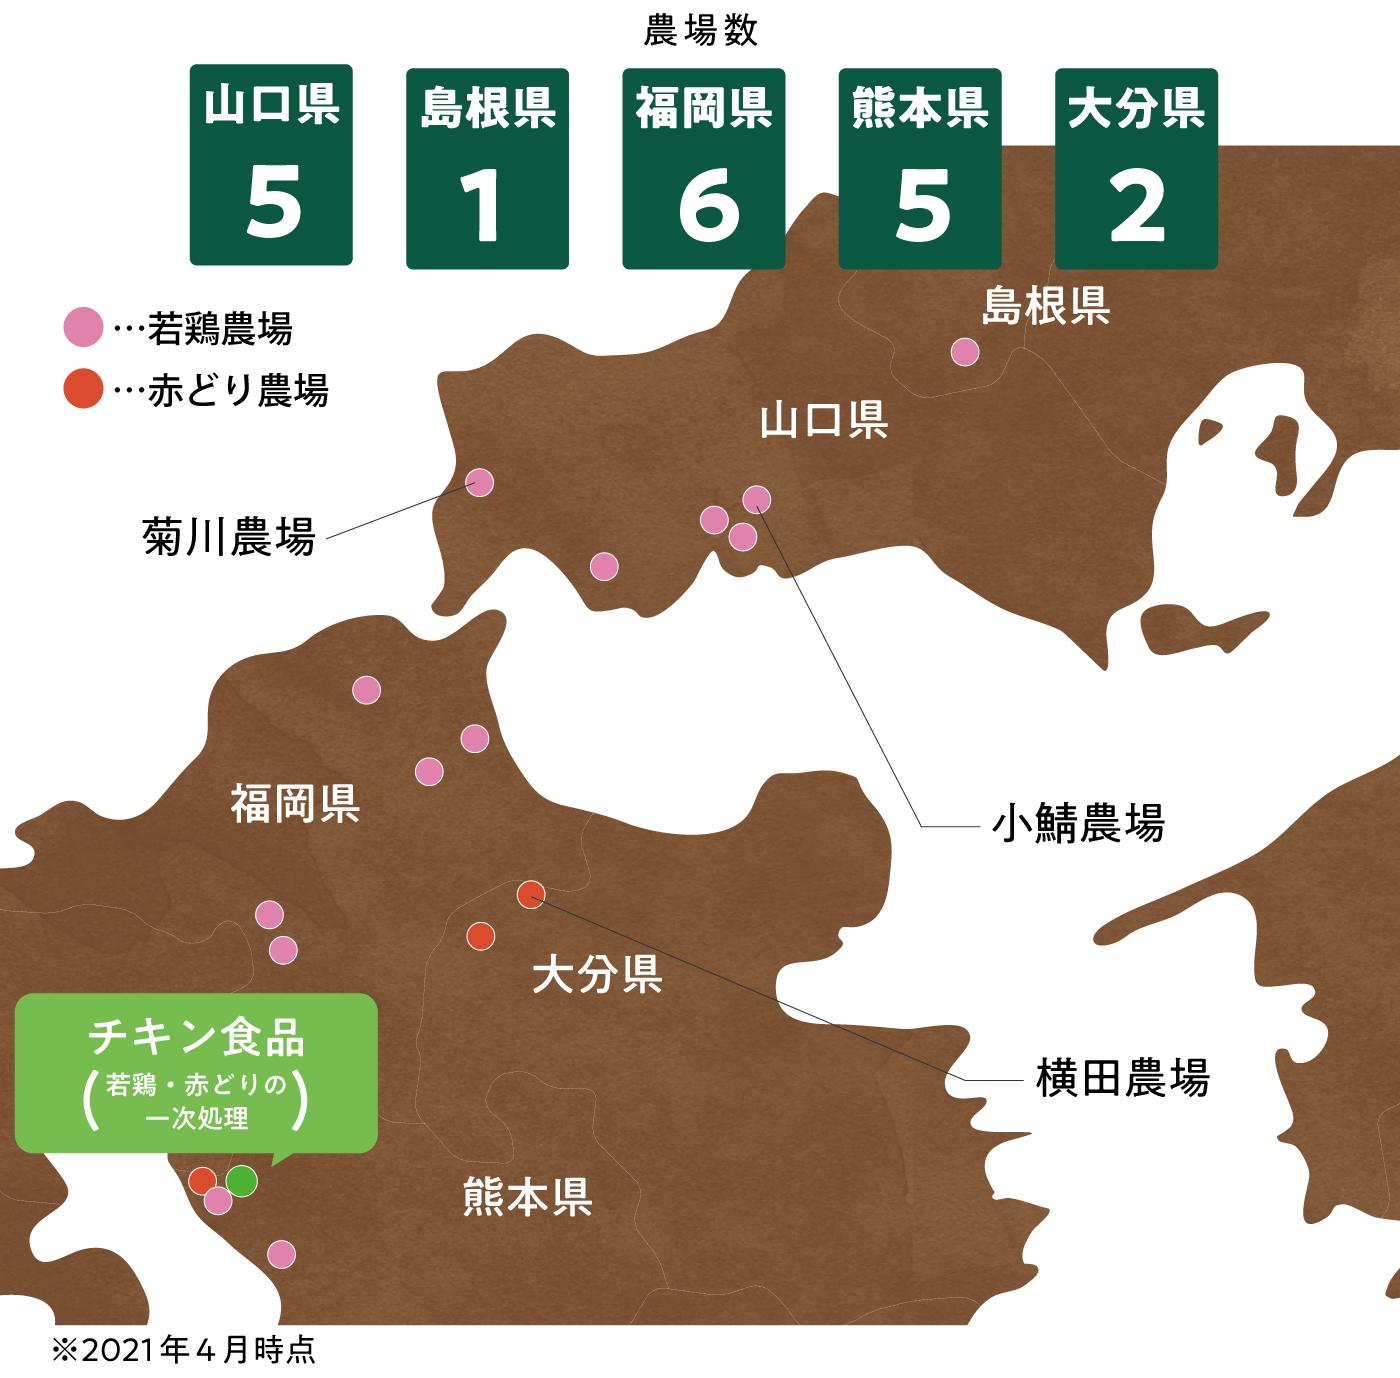 肉用鶏生産MAP